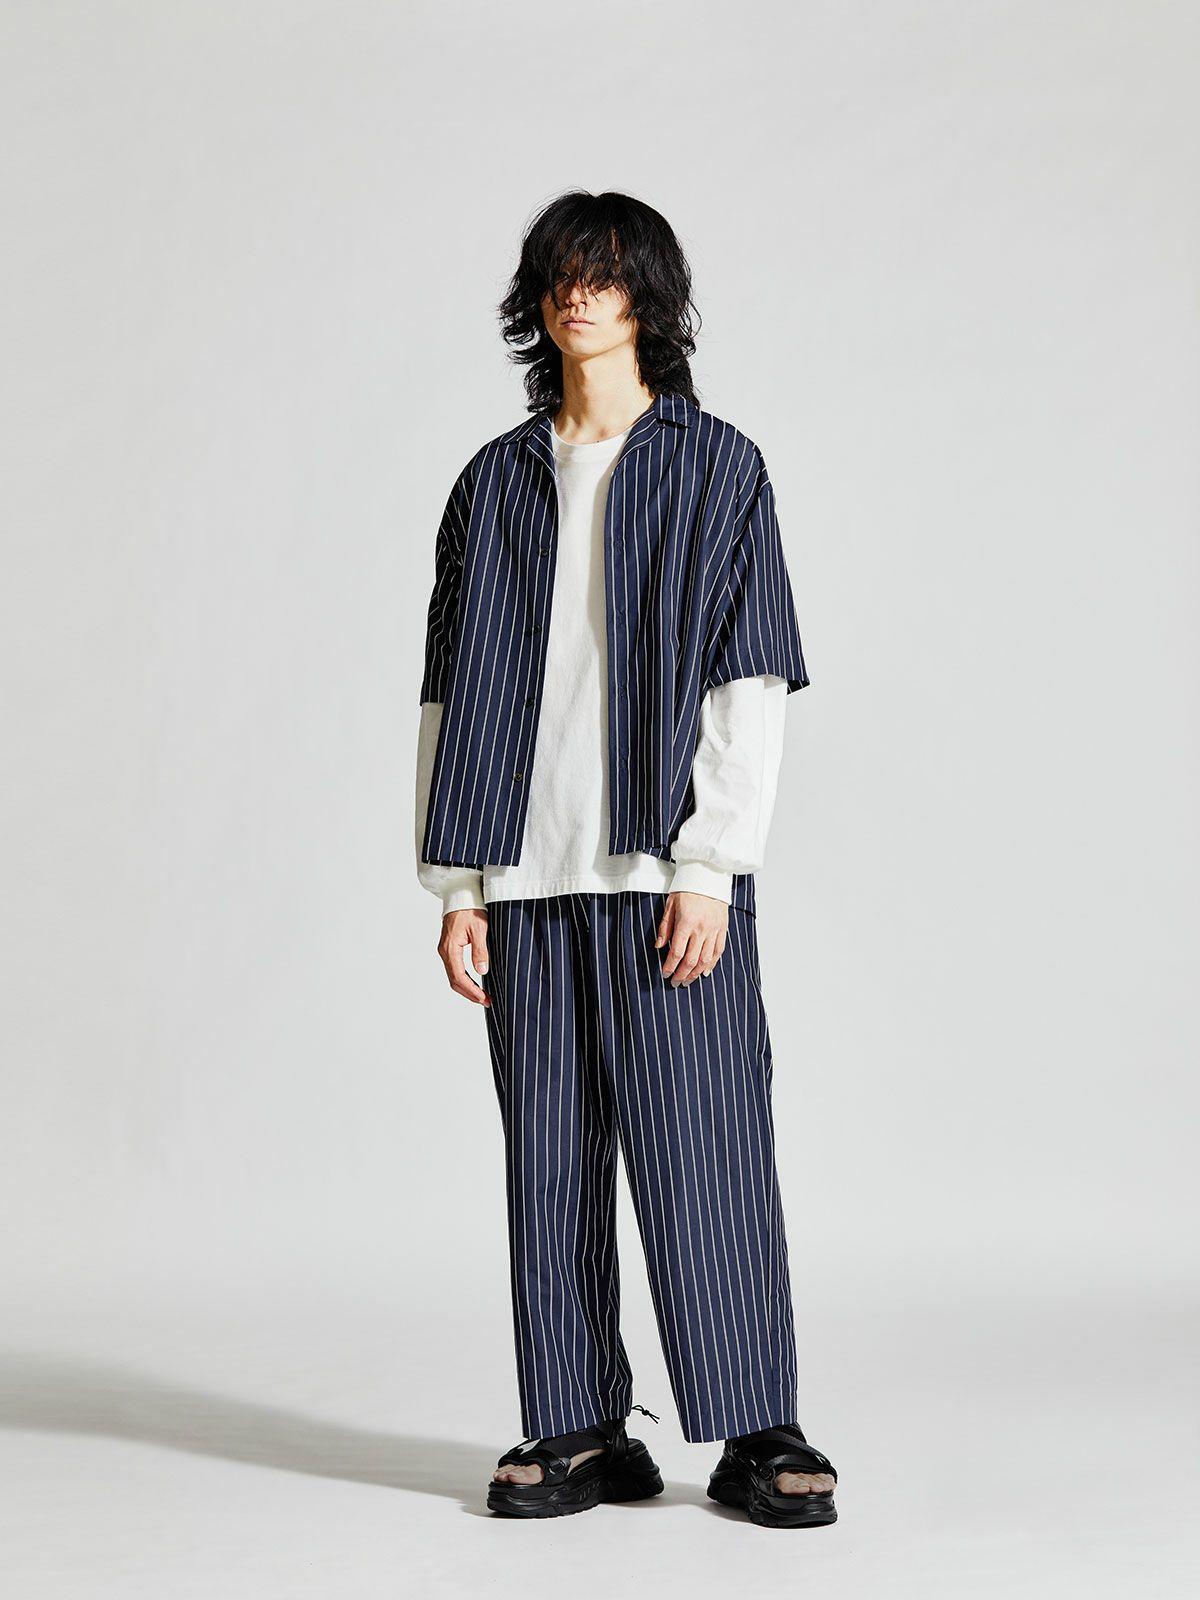 MIDIUMISOLID Men's ストライプハーフスリーブオープンカラーシャツ